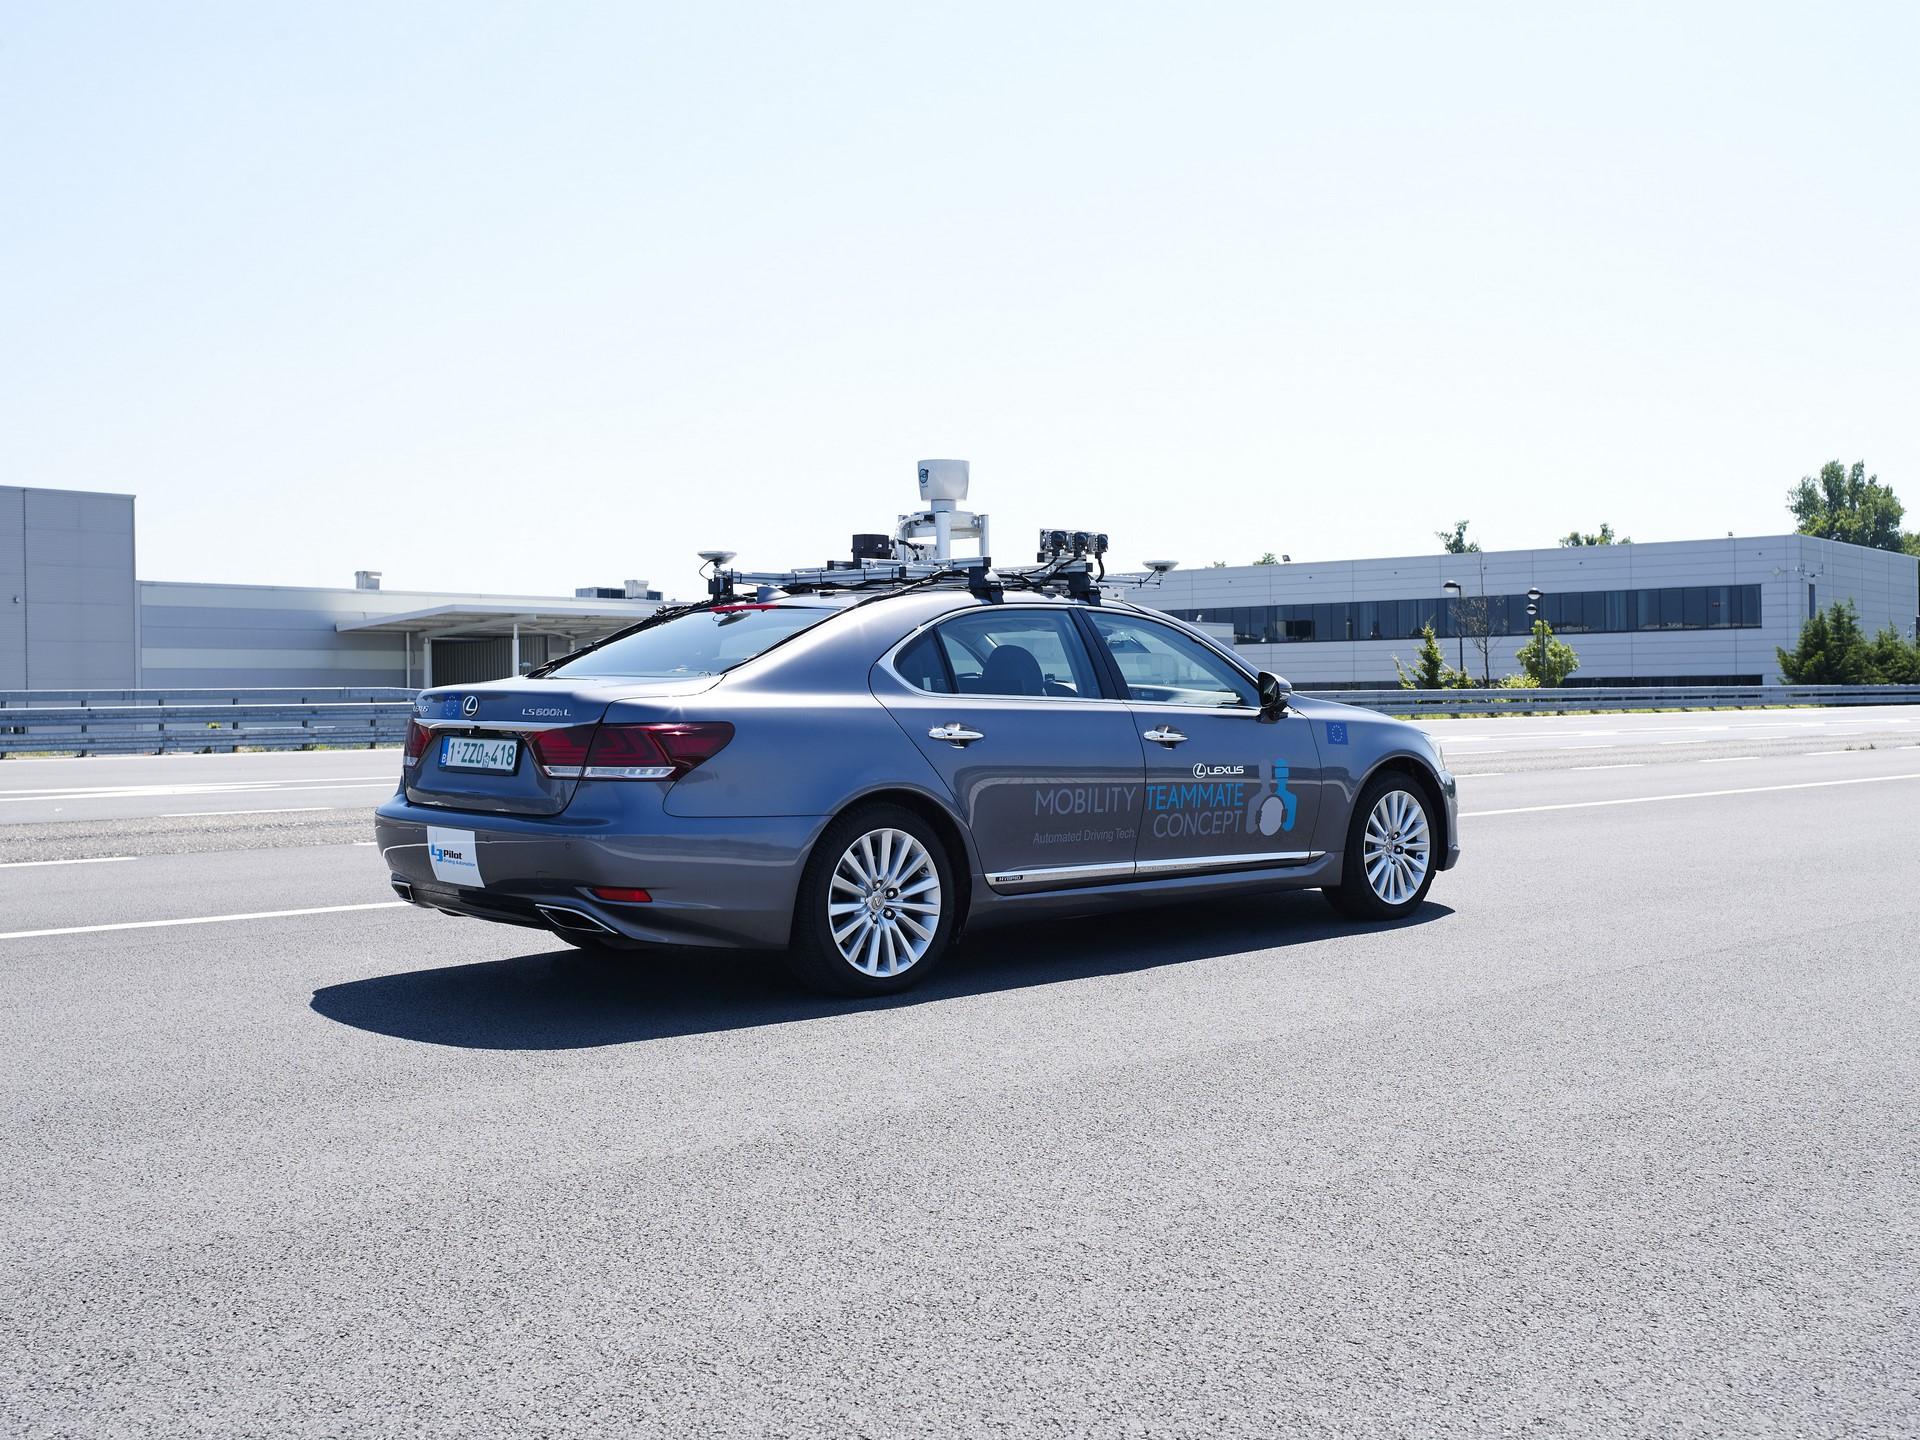 Toyota-Autonomous-Europe-Lexus-LS-1